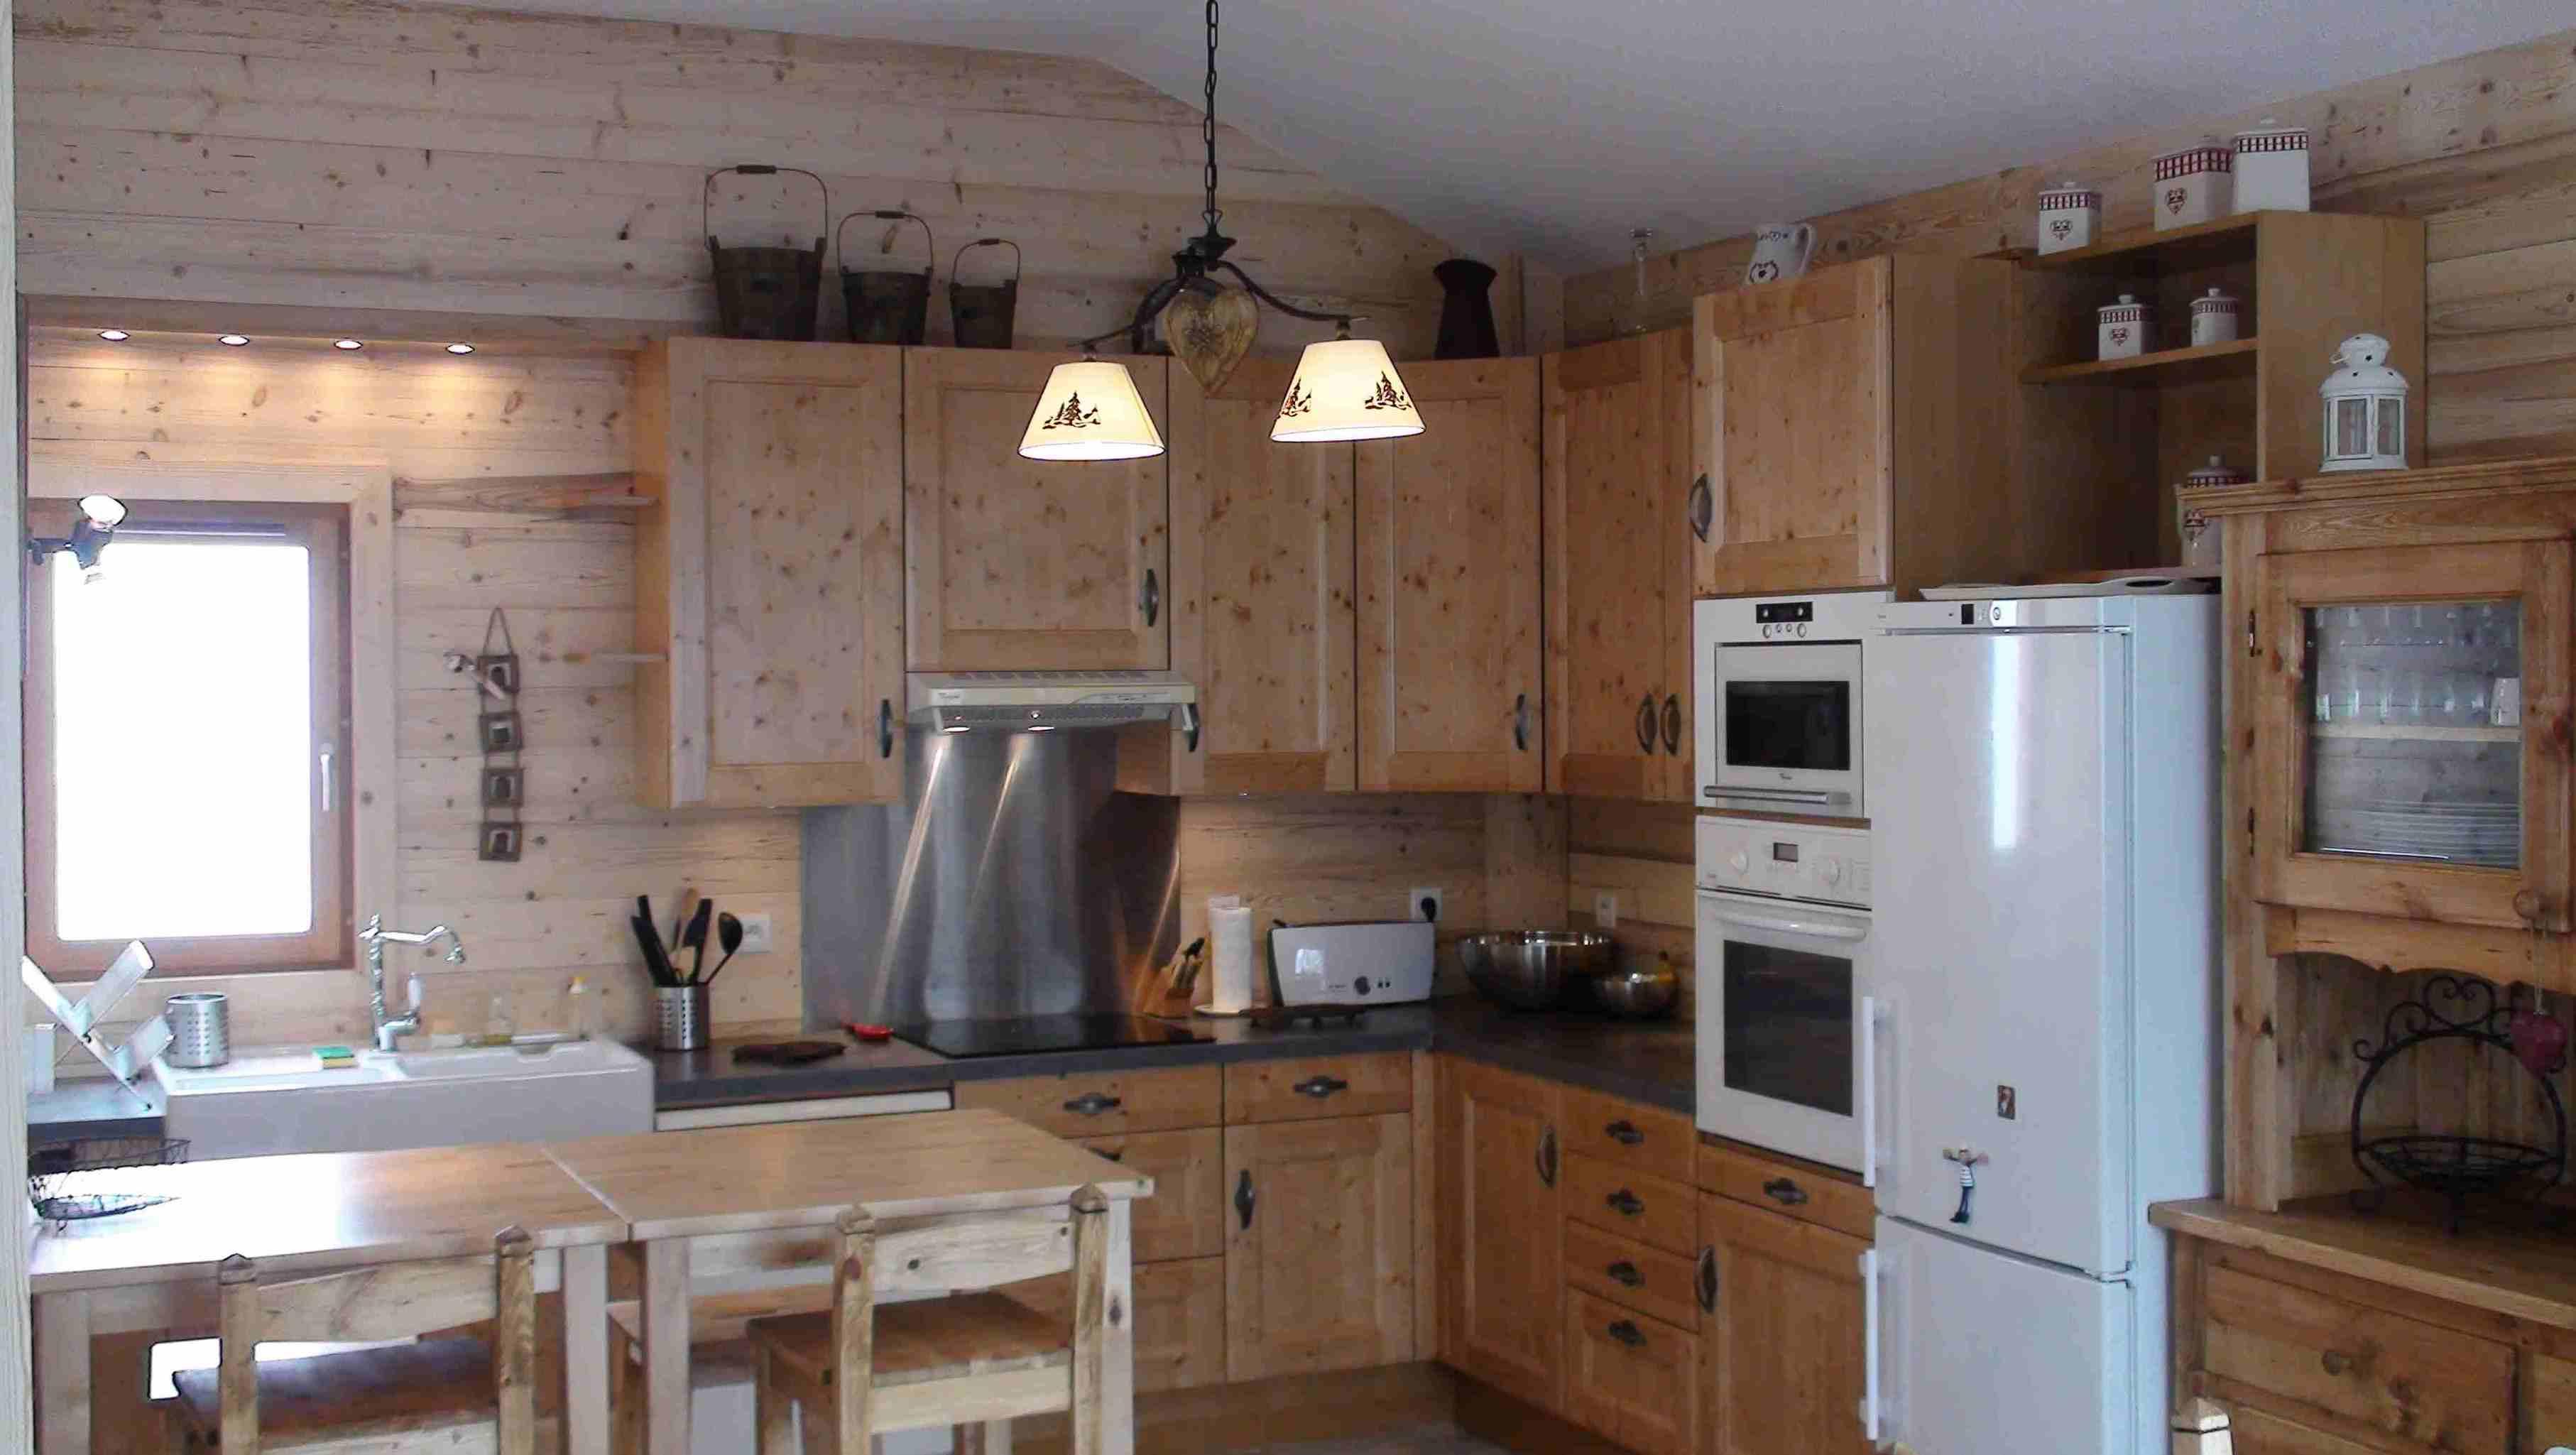 locations de vacances entre particuliers lvp. Black Bedroom Furniture Sets. Home Design Ideas